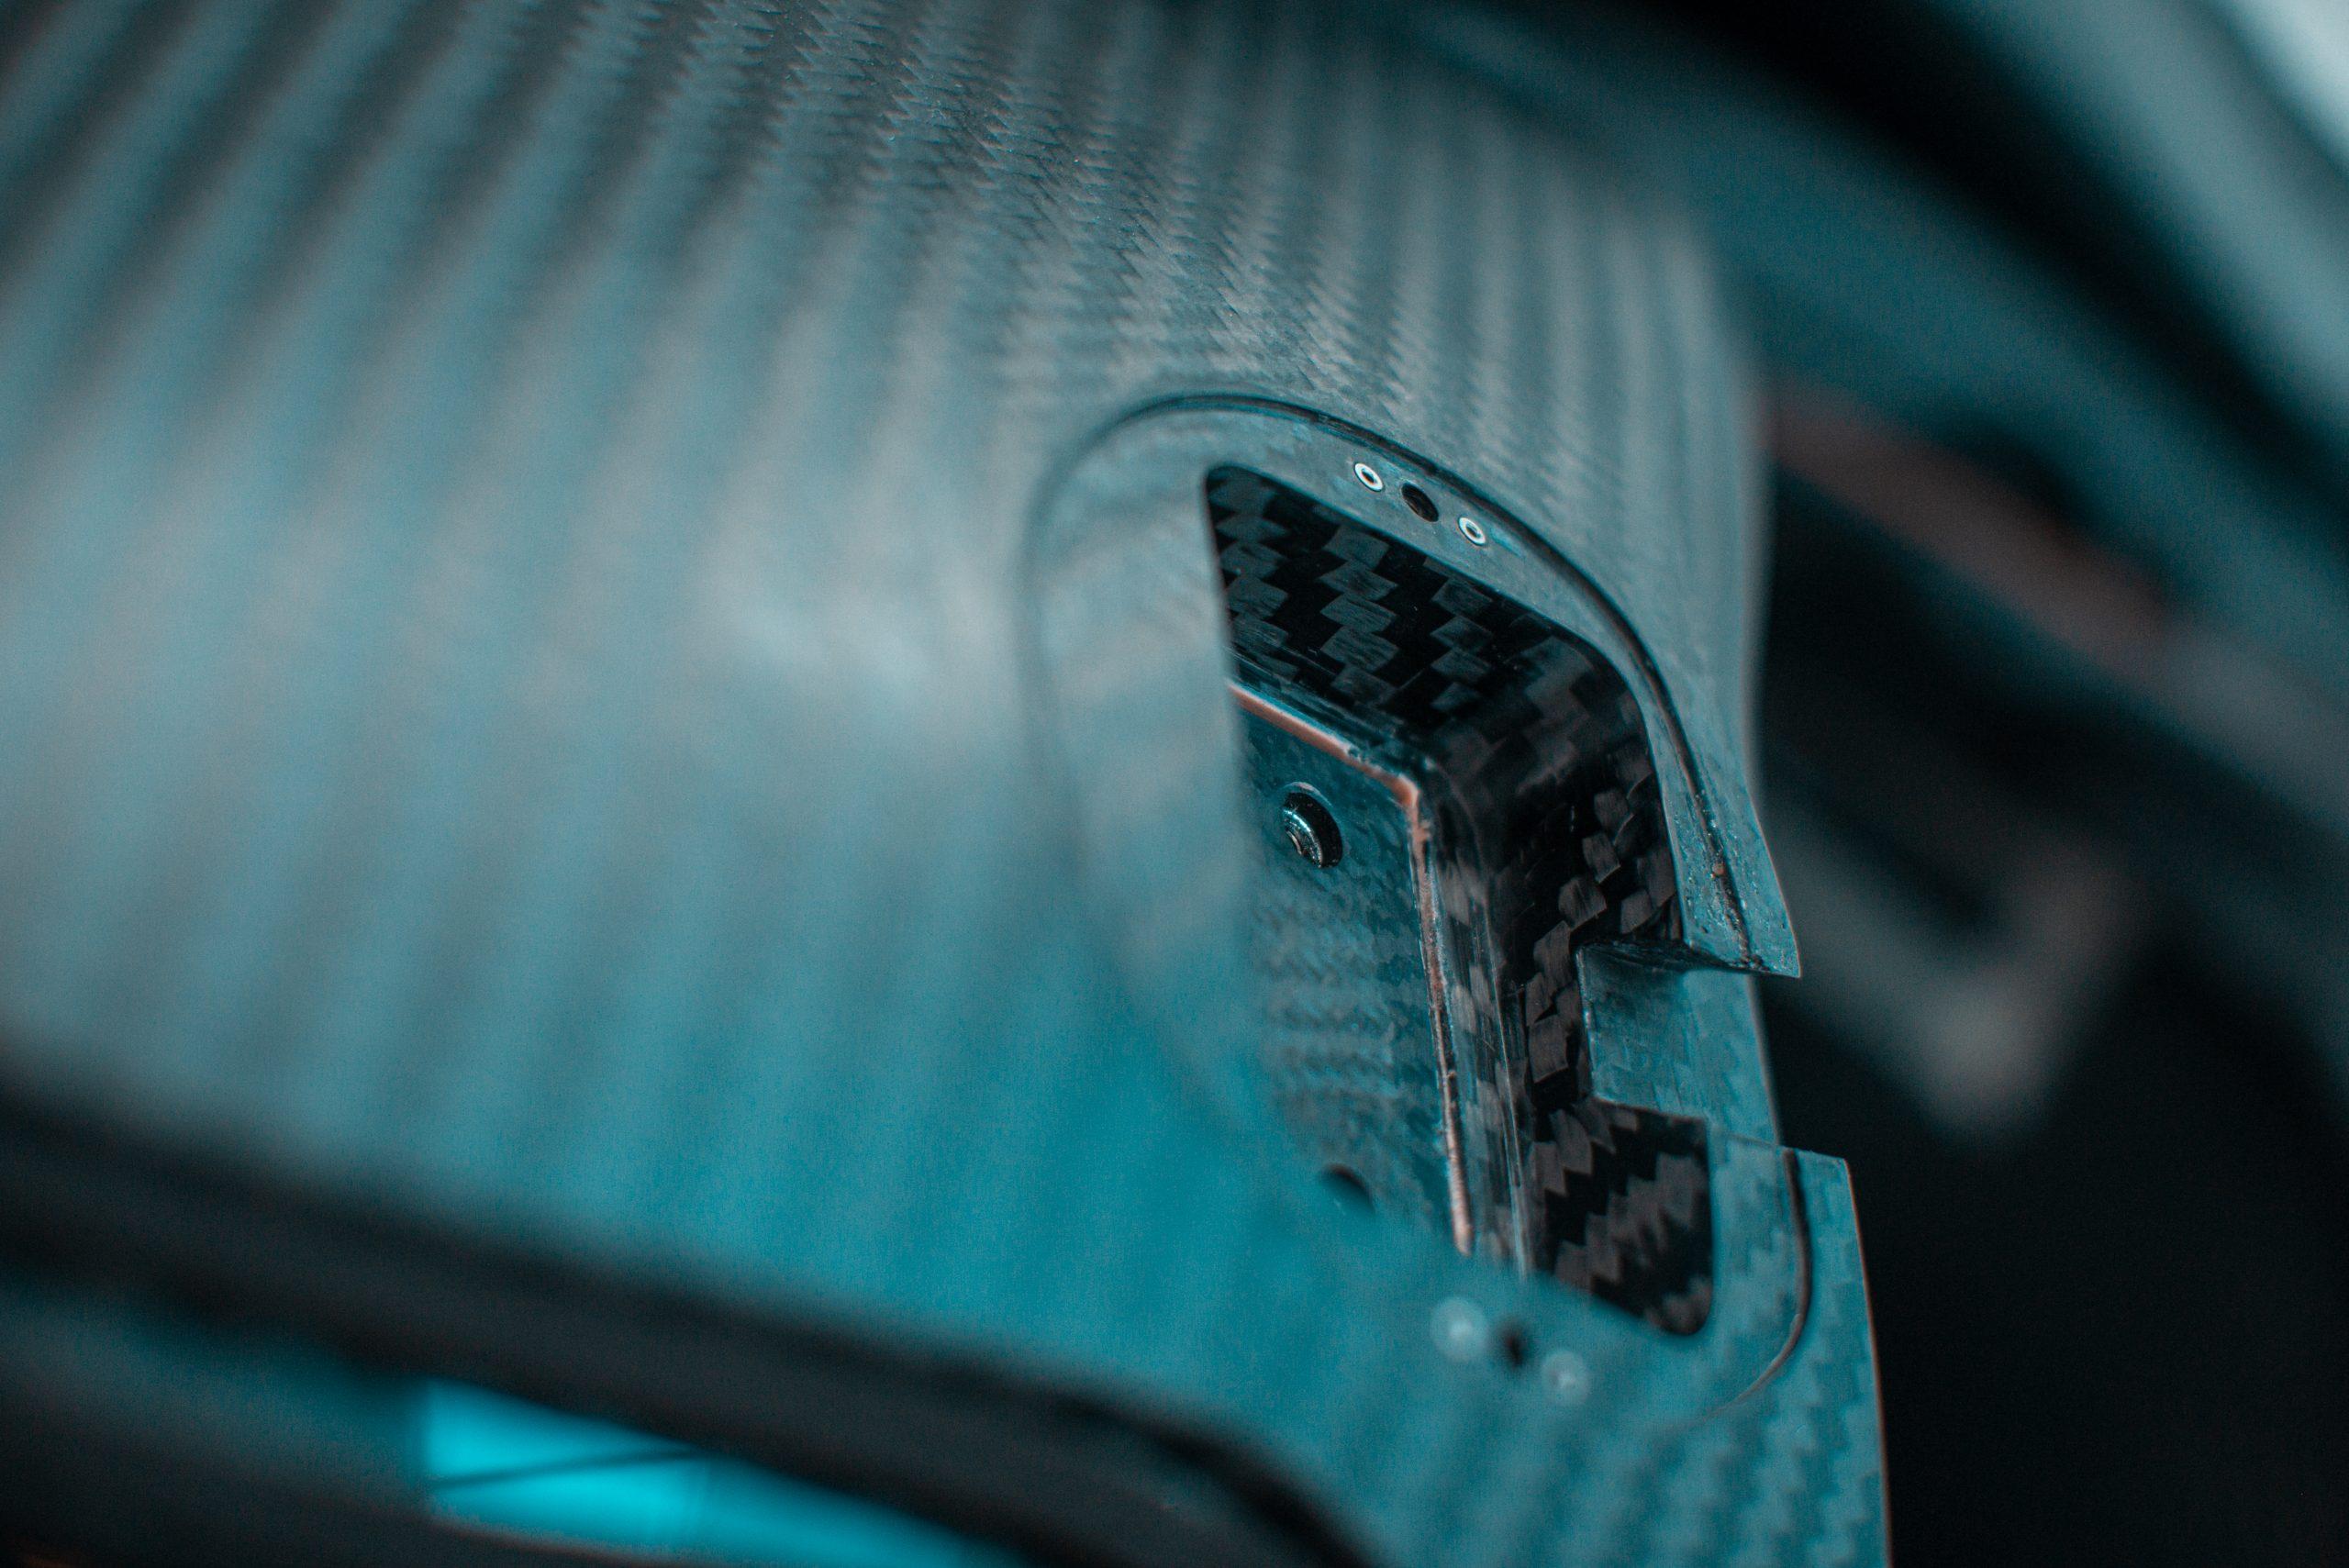 Glickenhaus 007 Hypercar LMH carbon fiber weave